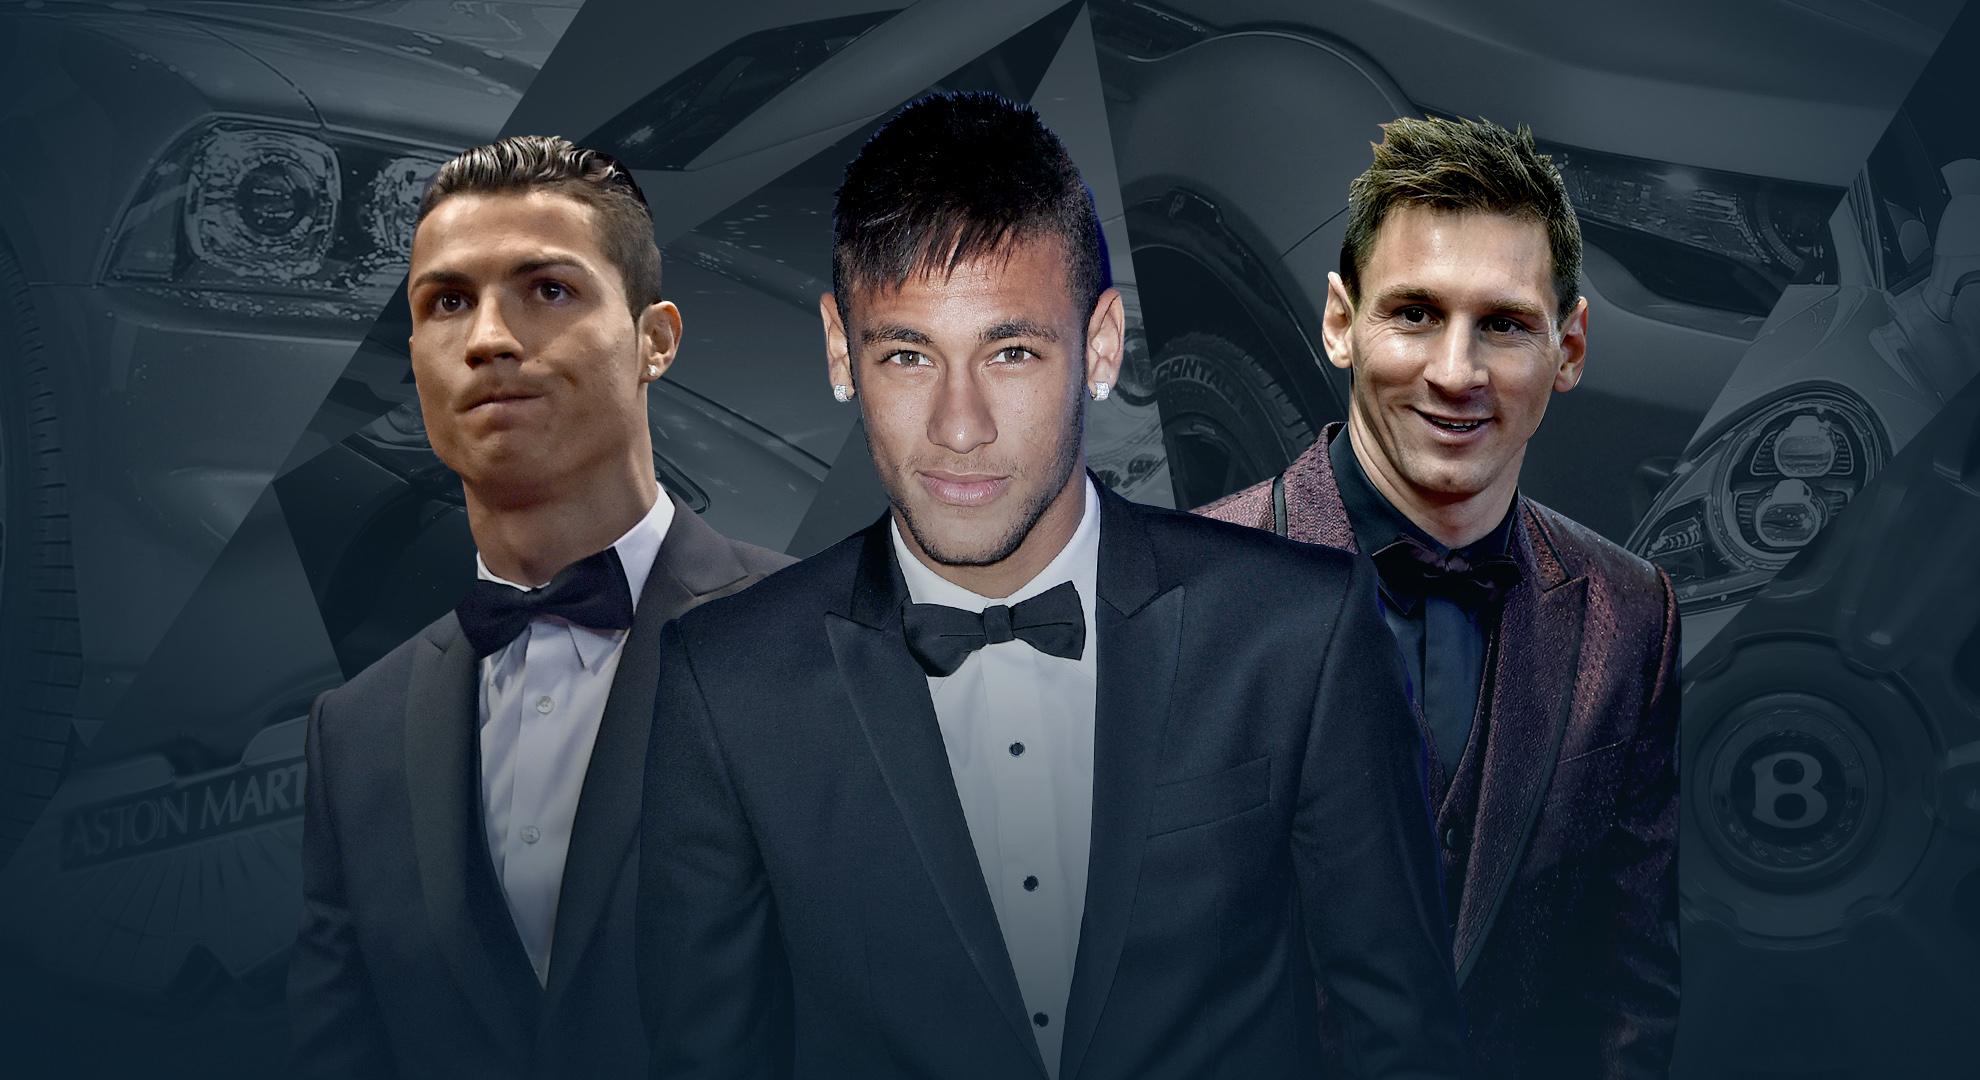 from ronaldo u0026 39 s rolls royce to messi u0026 39 s maserati - football stars and their cars